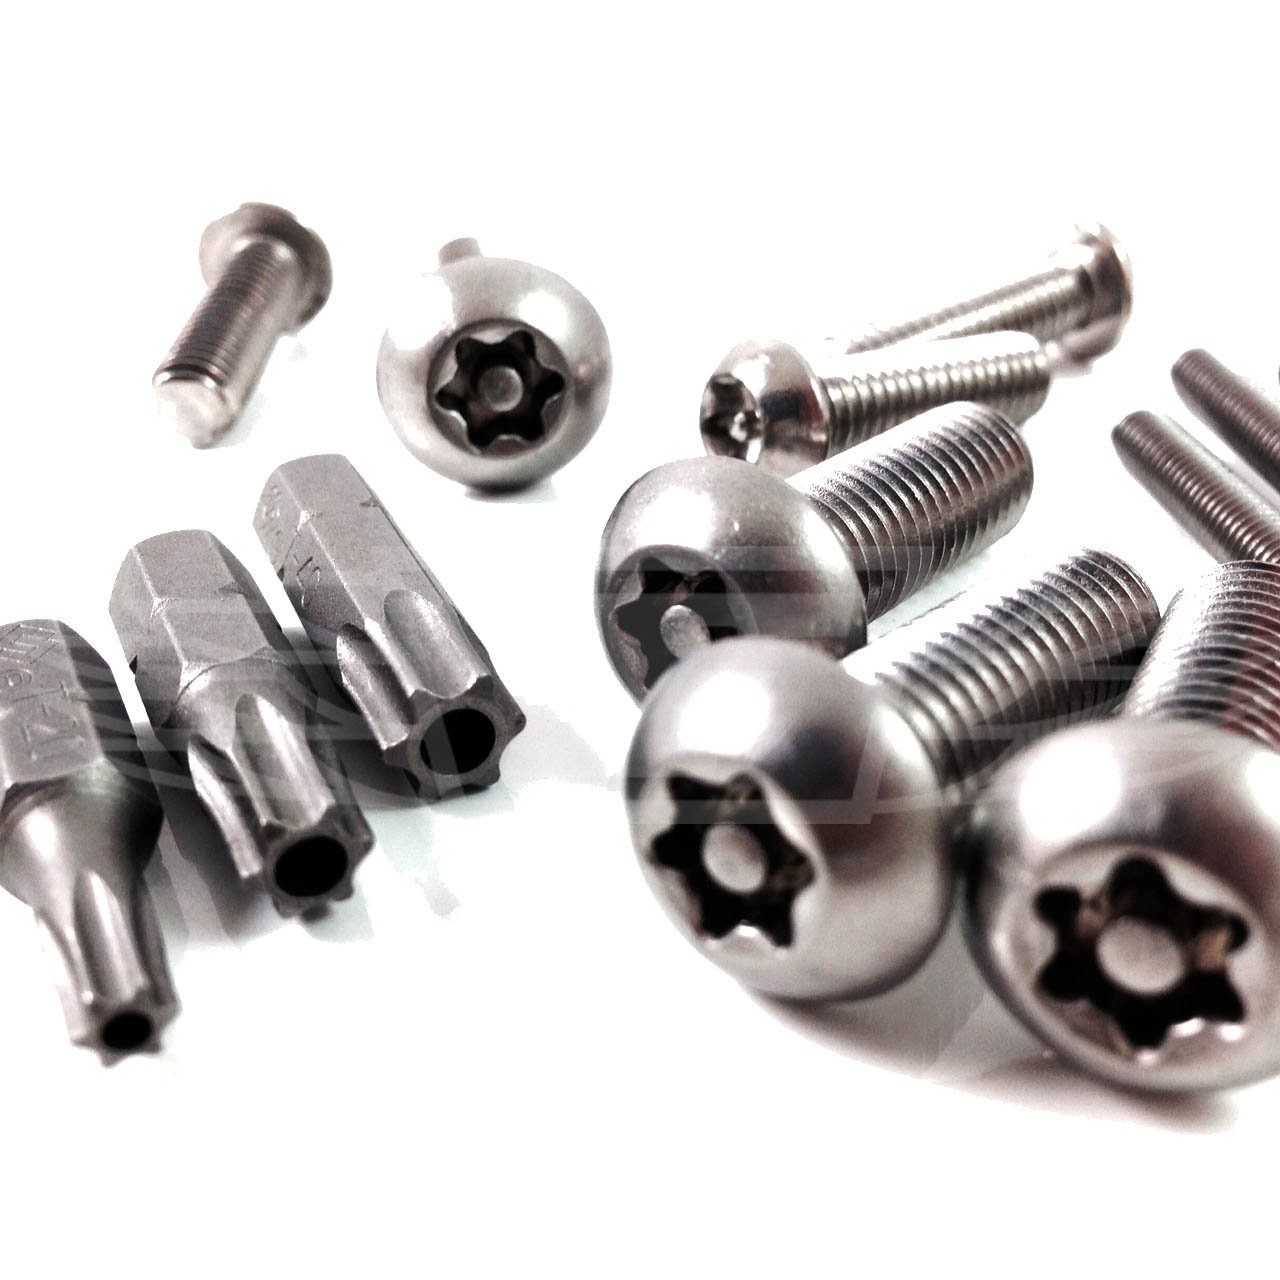 M6 A2 Button Head Torx Security Machine Screw Bolt Screws Stainless Steel